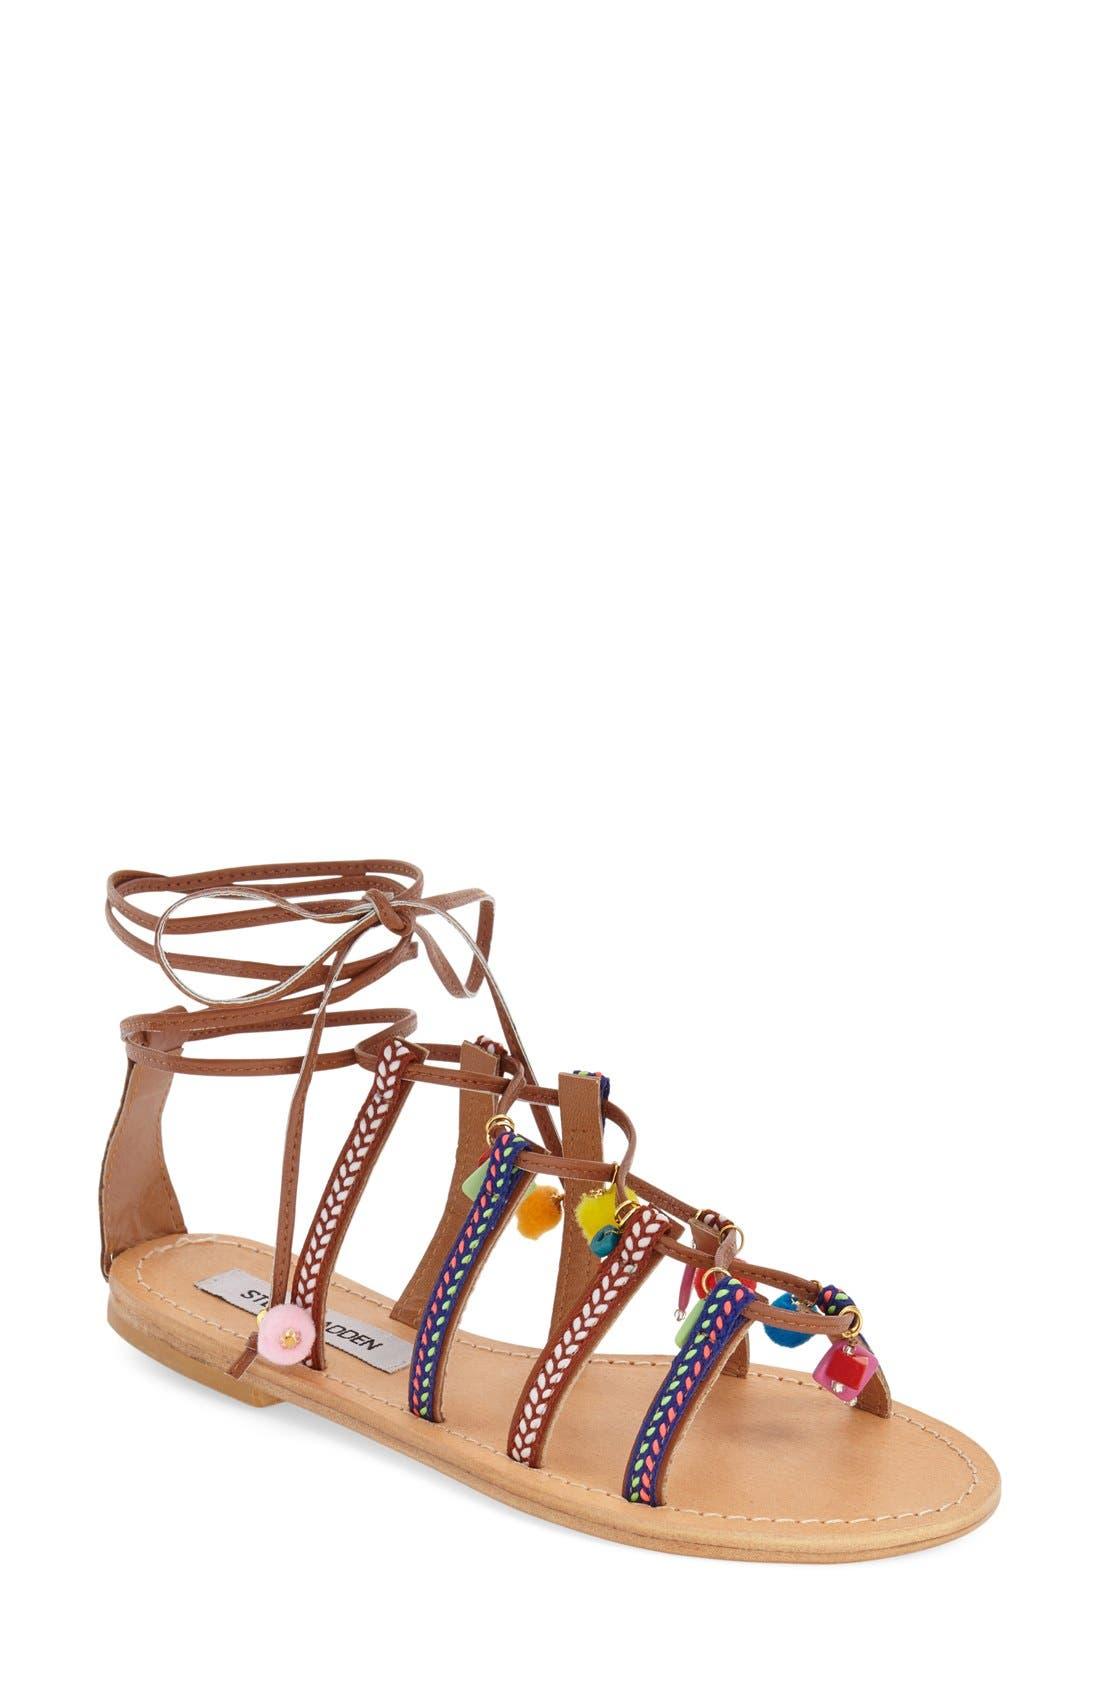 Main Image - Steve Madden 'Ommaha' Embellished Lace-up Sandal (Women)